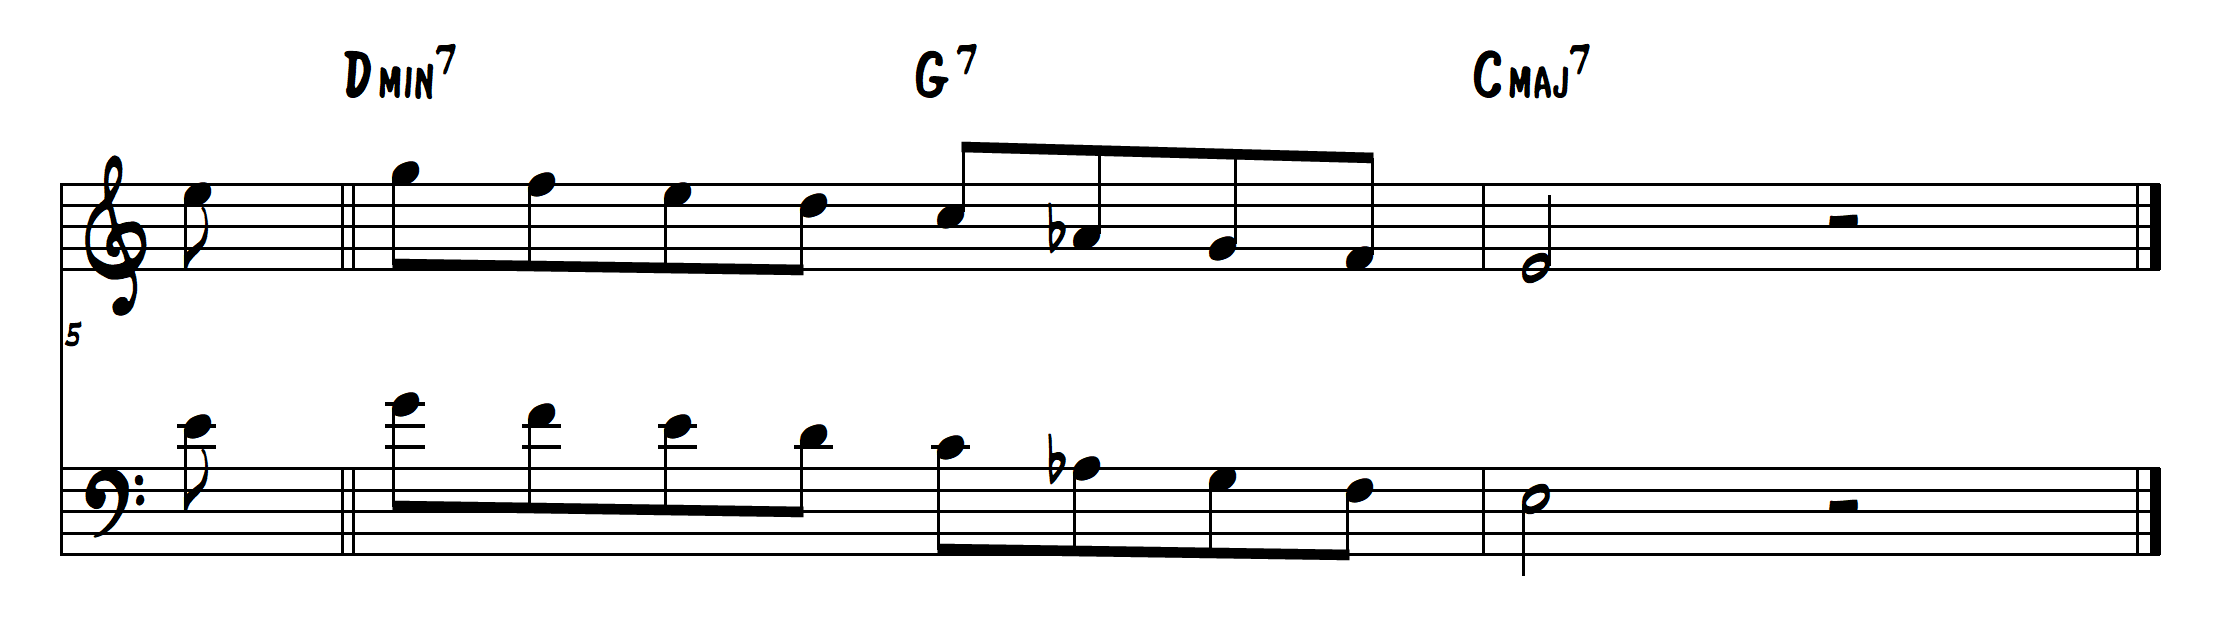 altered jazz lick